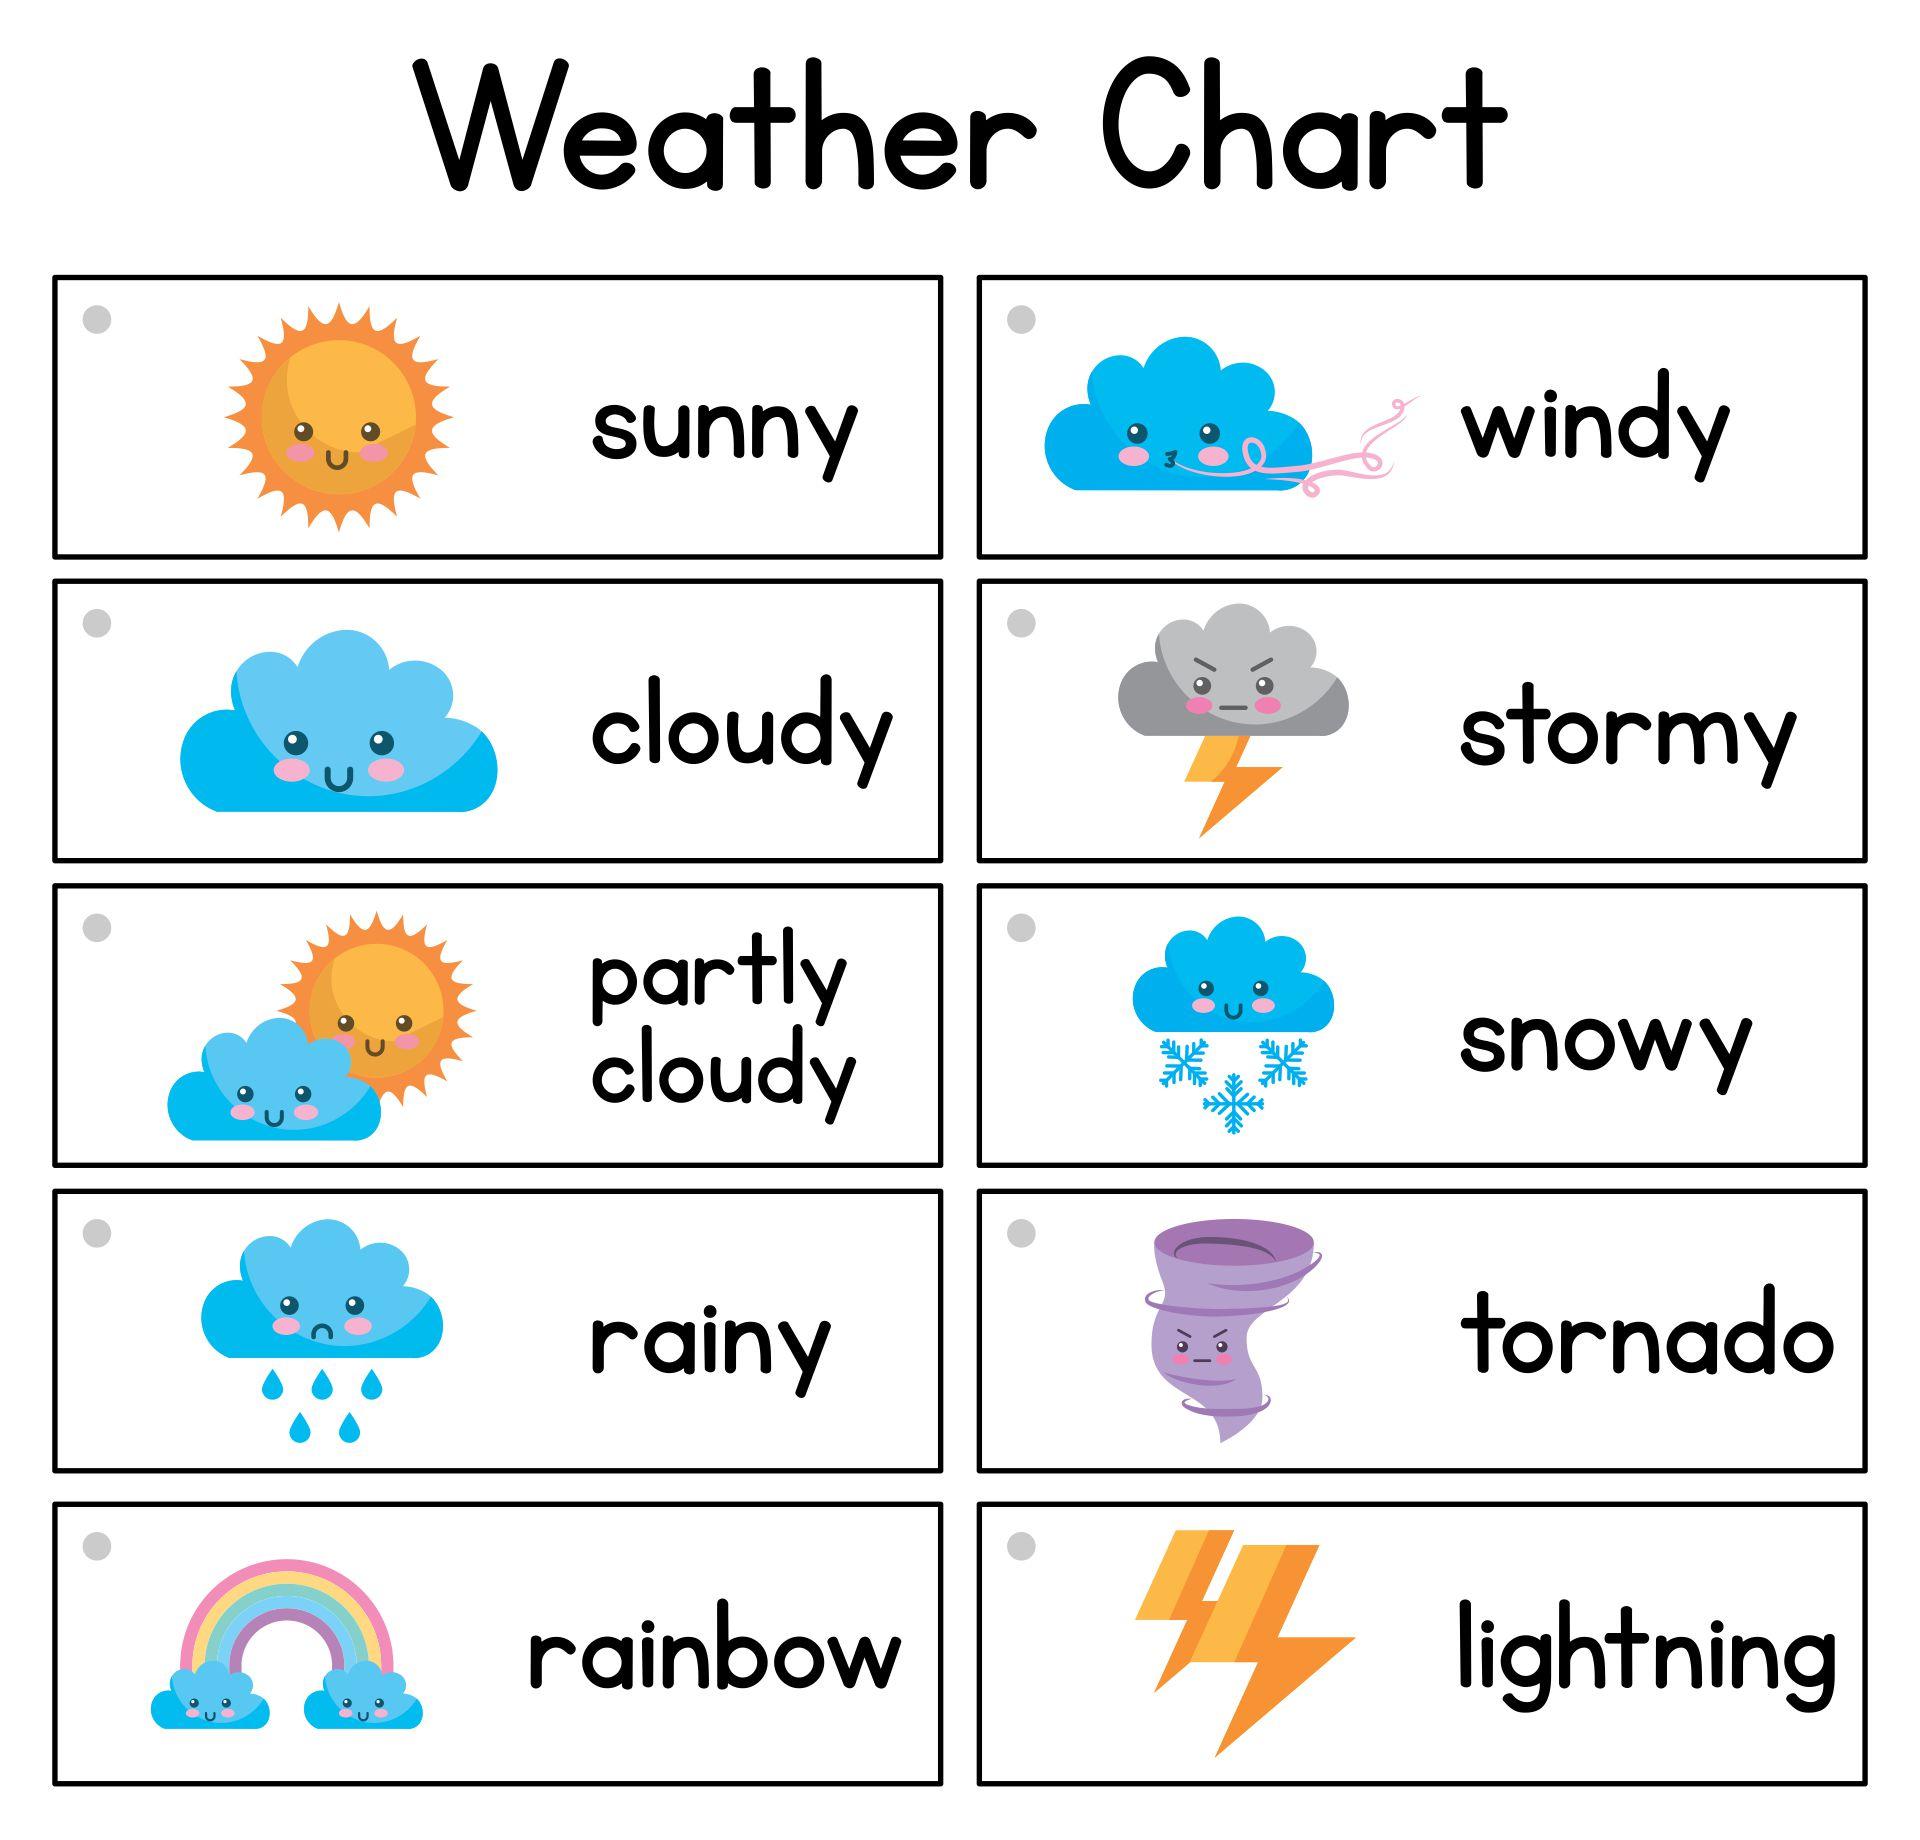 Weather Chart For Preschool Classroom Printable